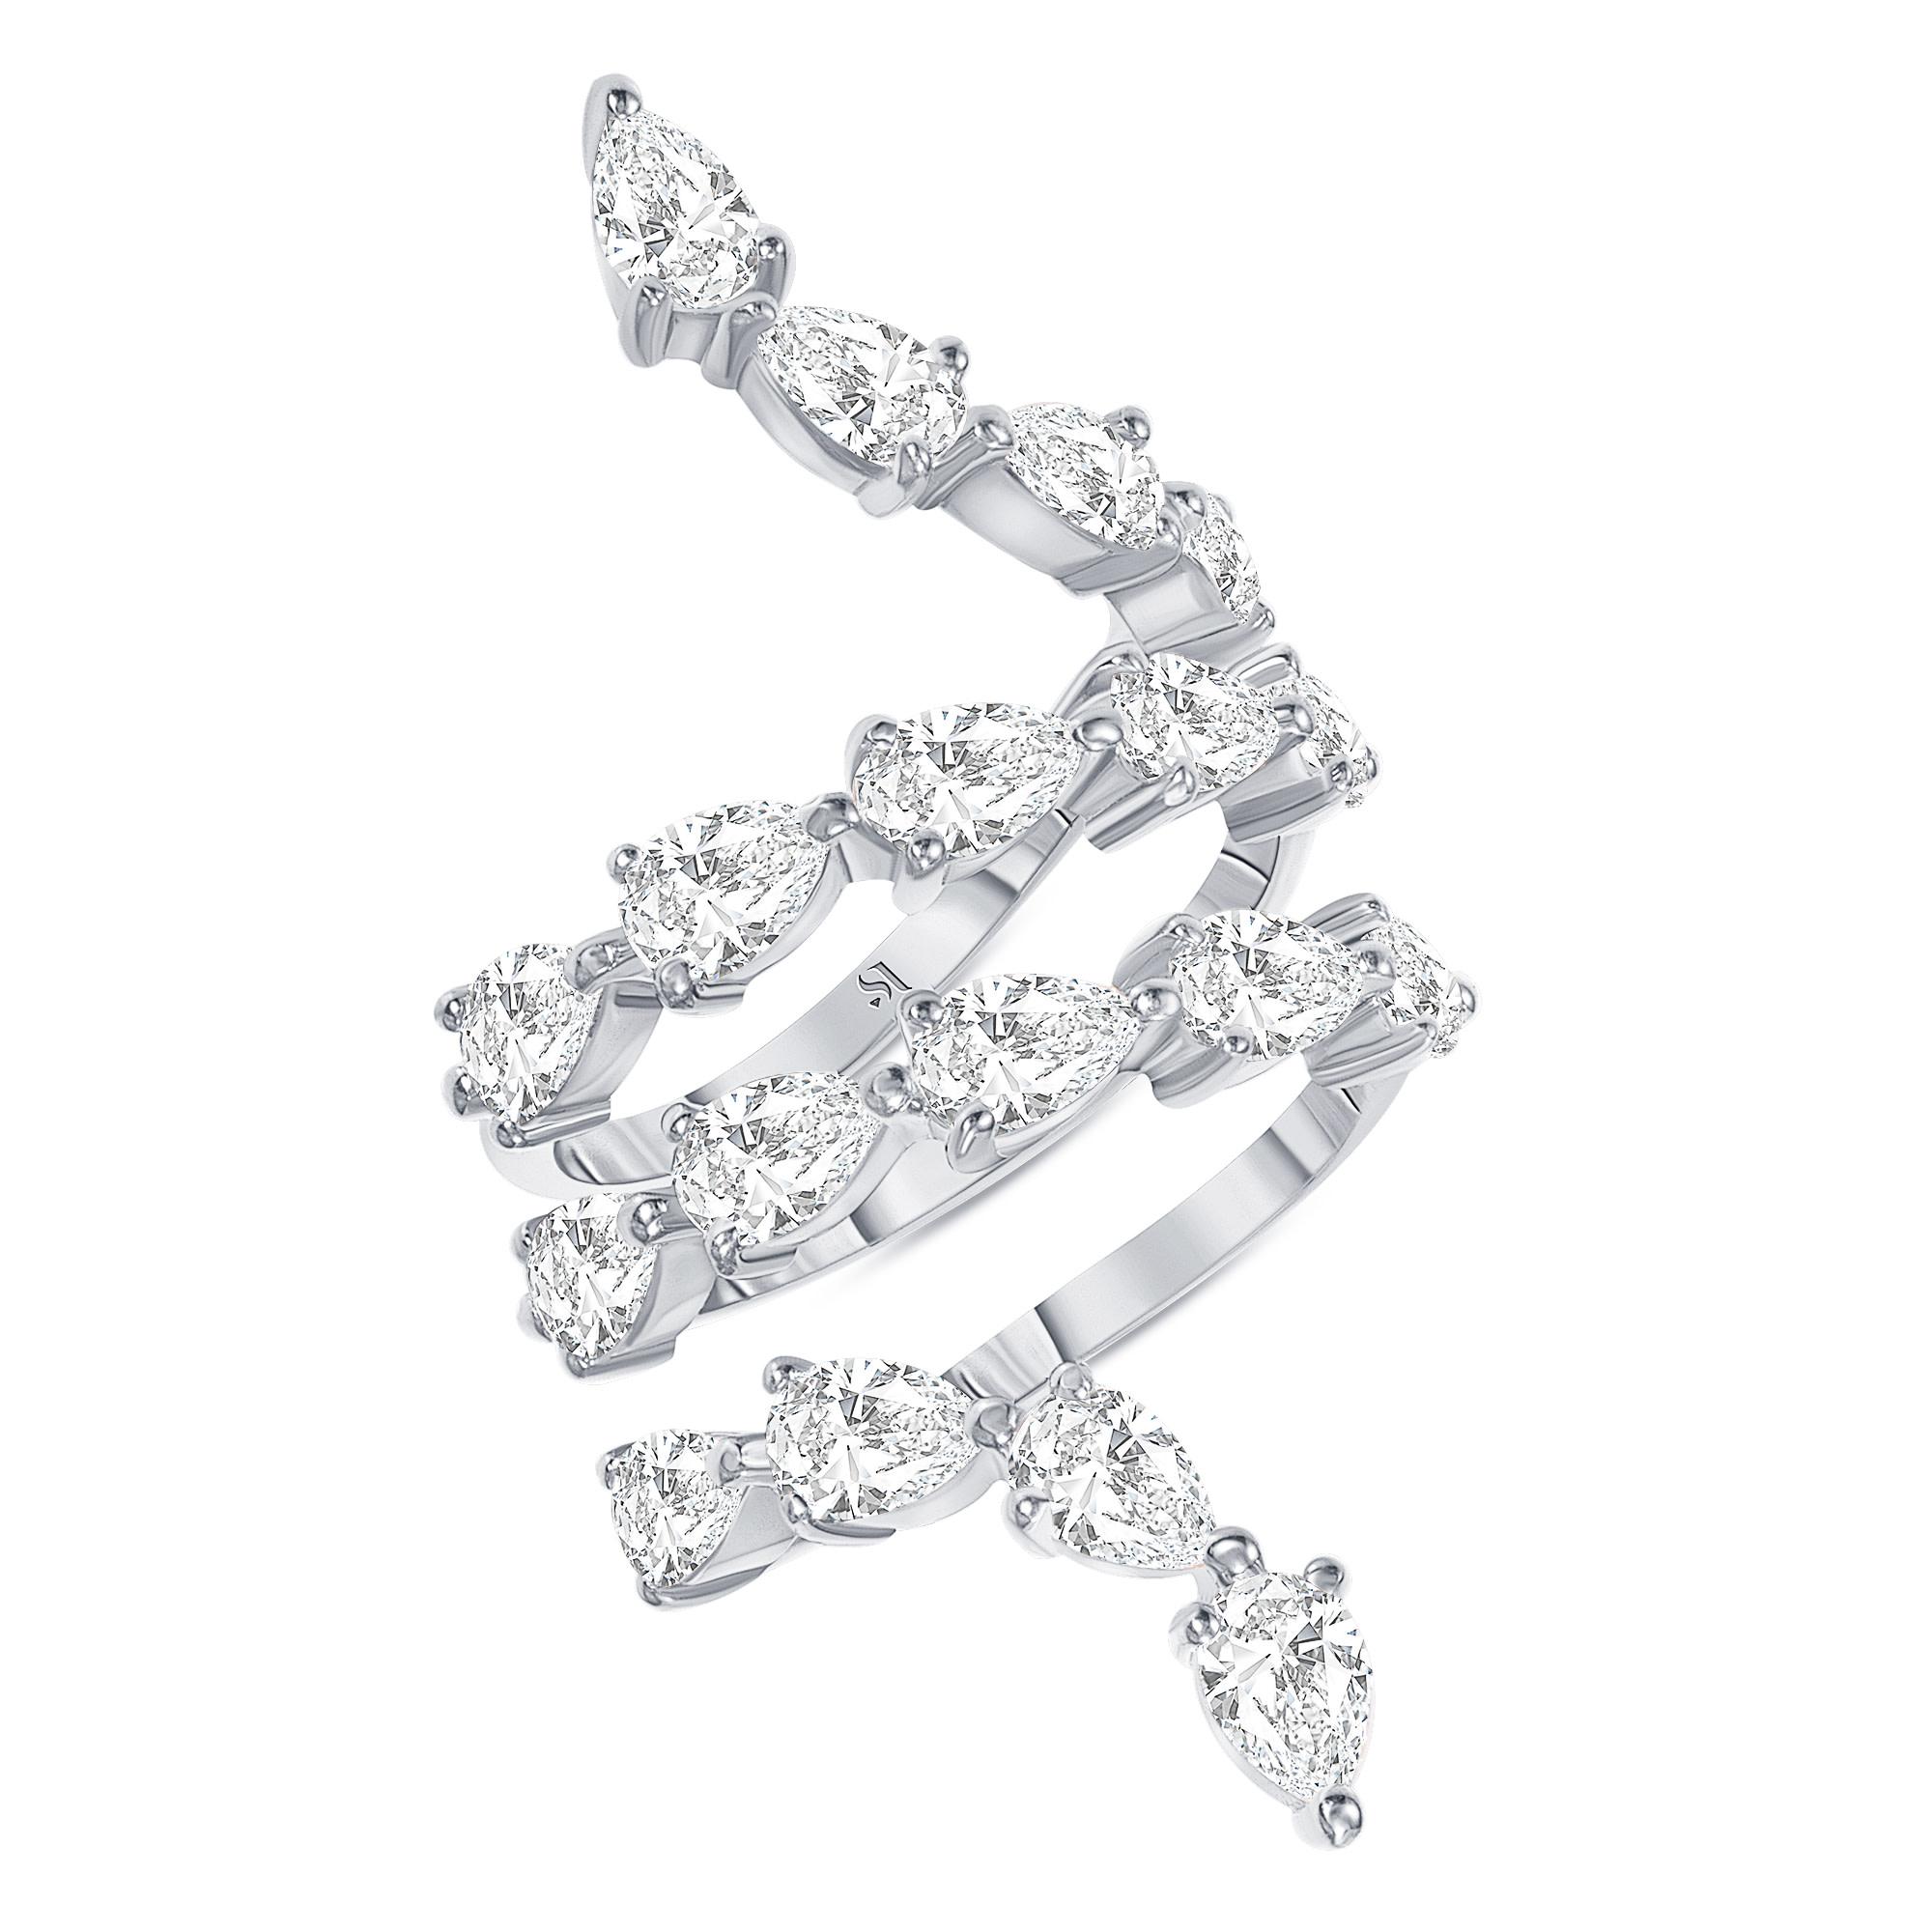 Spiral Pear Shape Diamond Ring | Sabrina A Inc